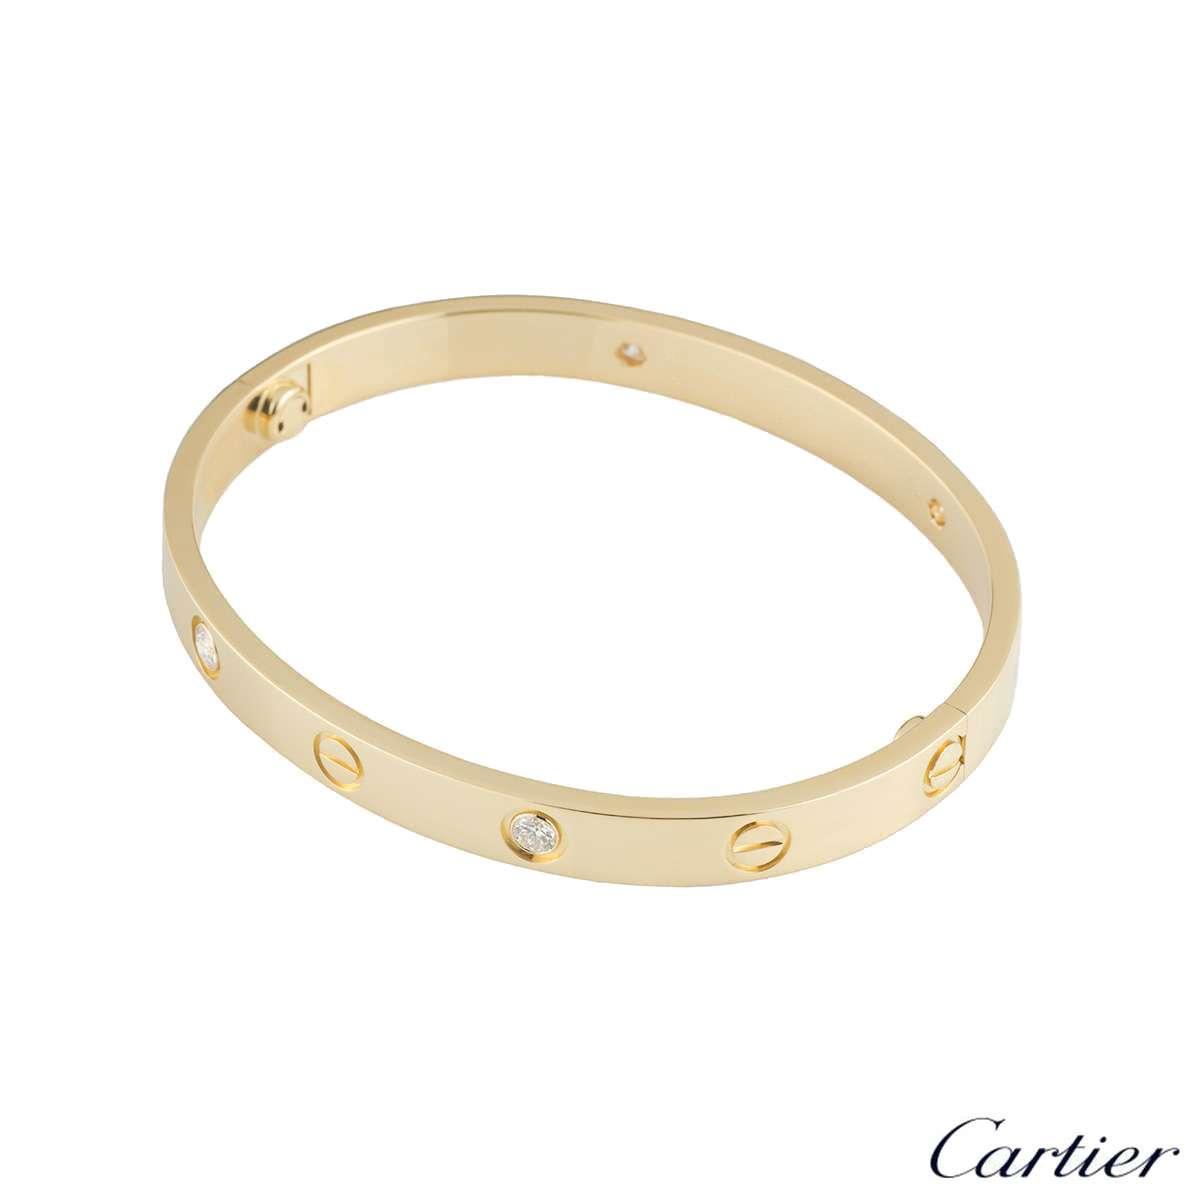 Cartier Yellow Gold Half Diamond Love Bracelet Size 18 B6035918